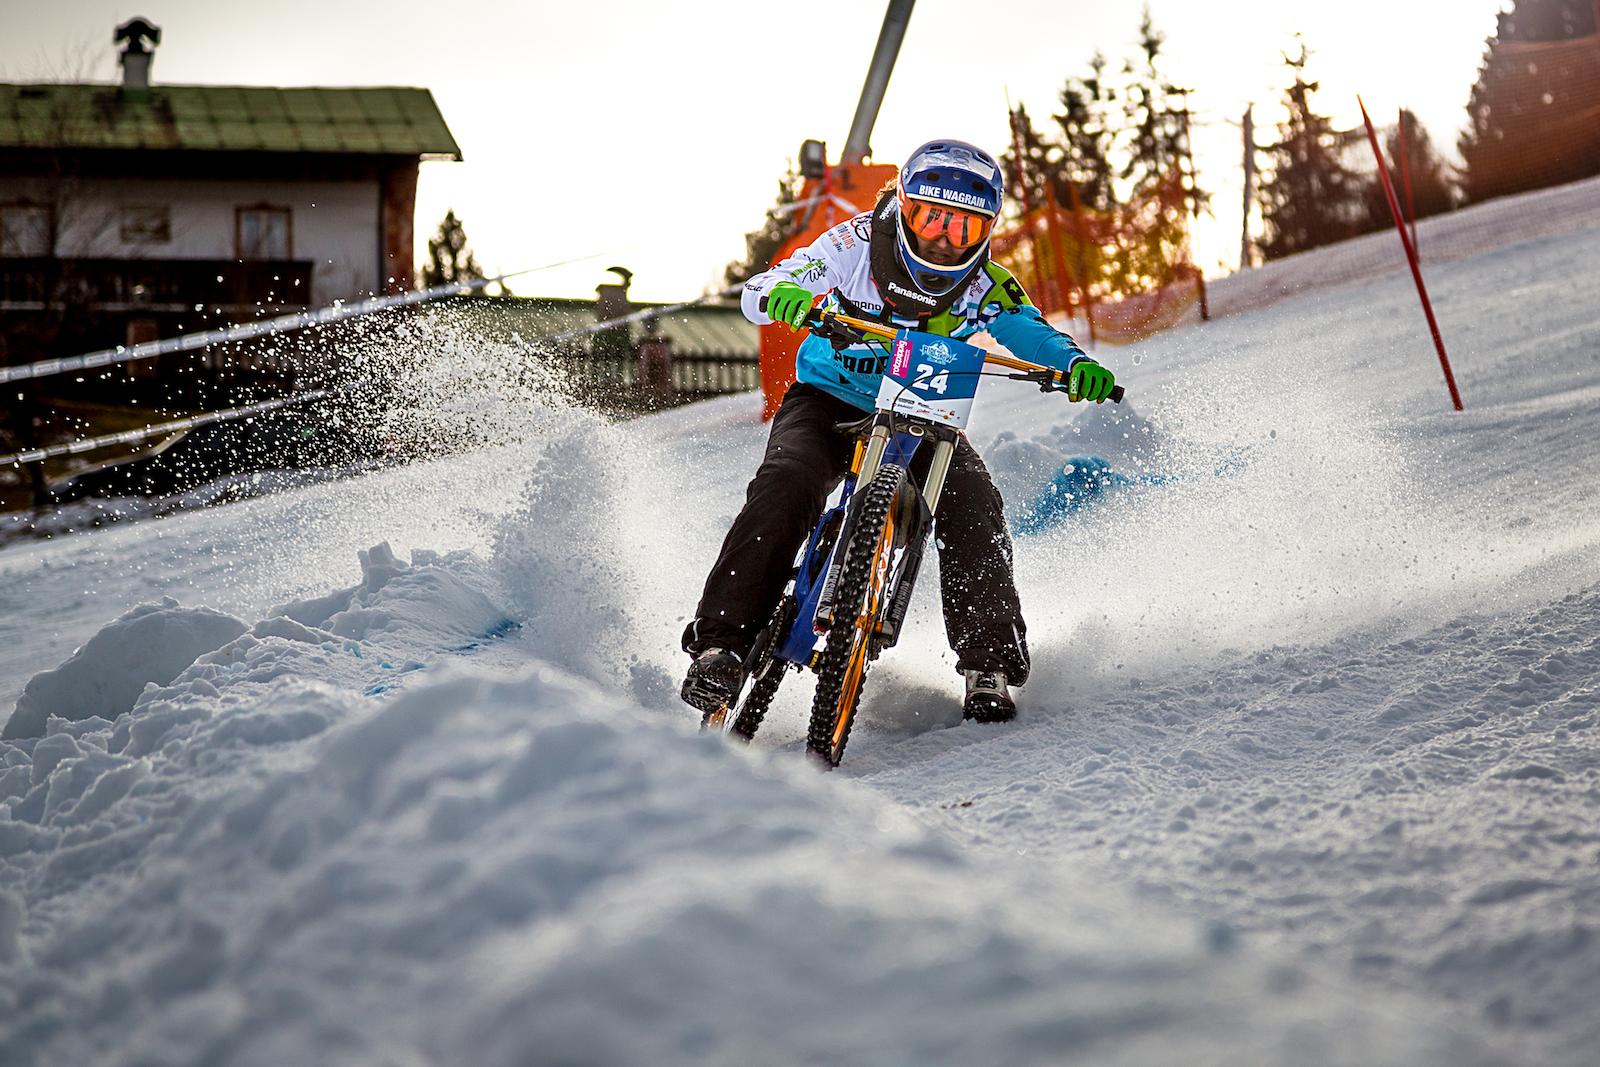 Elke-Rabeder-Ride-Hard-on-Snow_Foto(c)Friedrich-Simon-Kugi